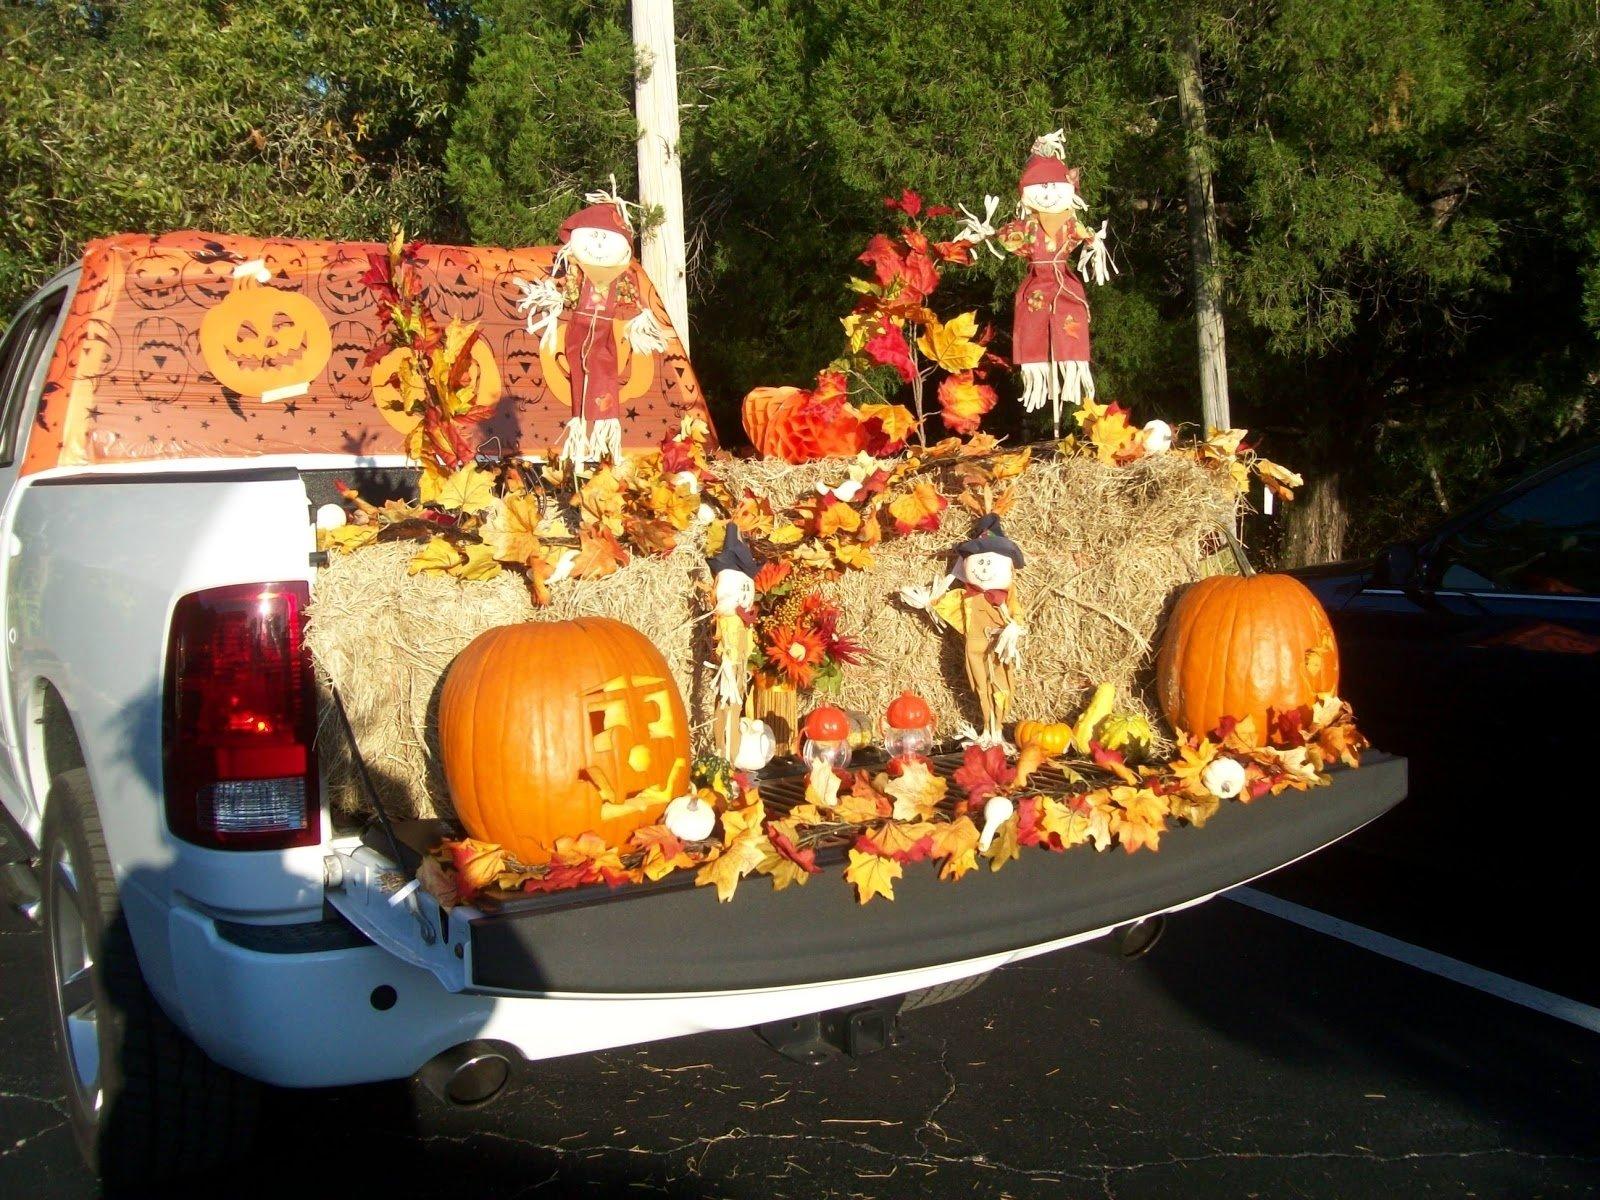 10 Nice Halloween Trunk Or Treat Ideas future non scary trunk or treat ideas 5 2020